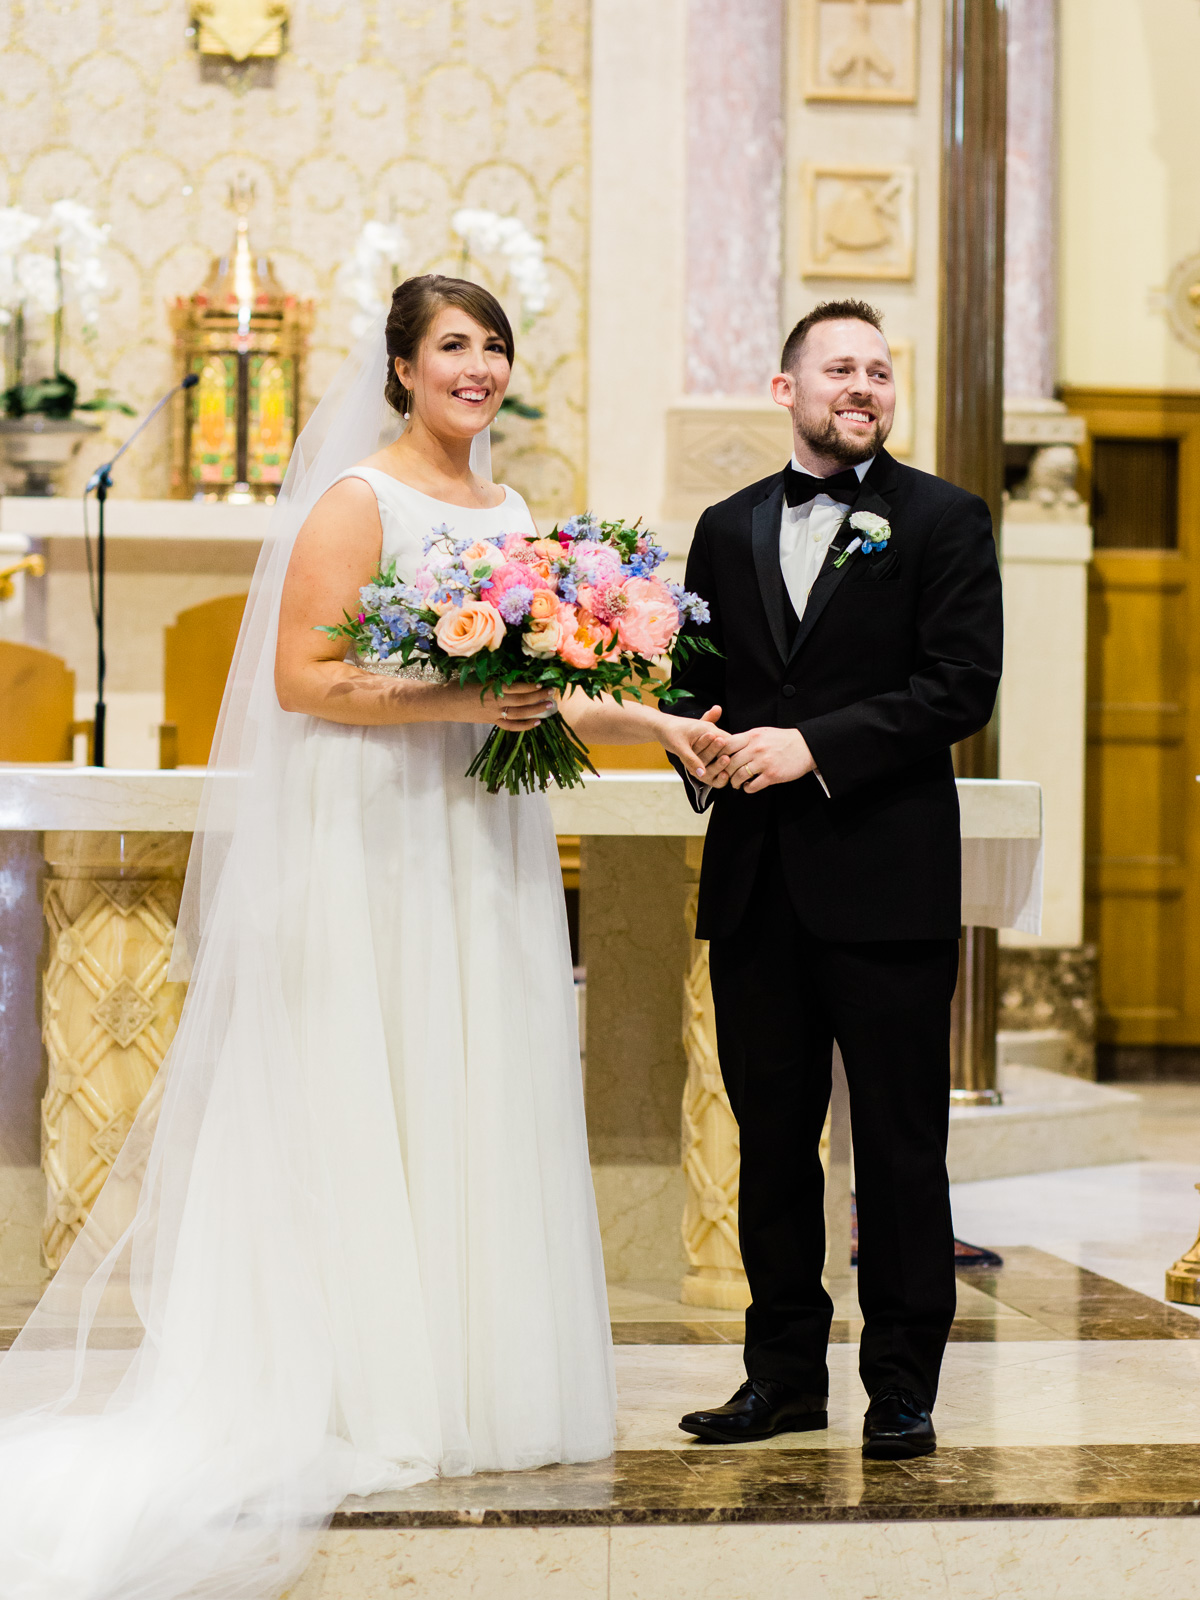 Bright and Joyful Cleveland Wedding Photography at Music Box Supper Club-21.jpg